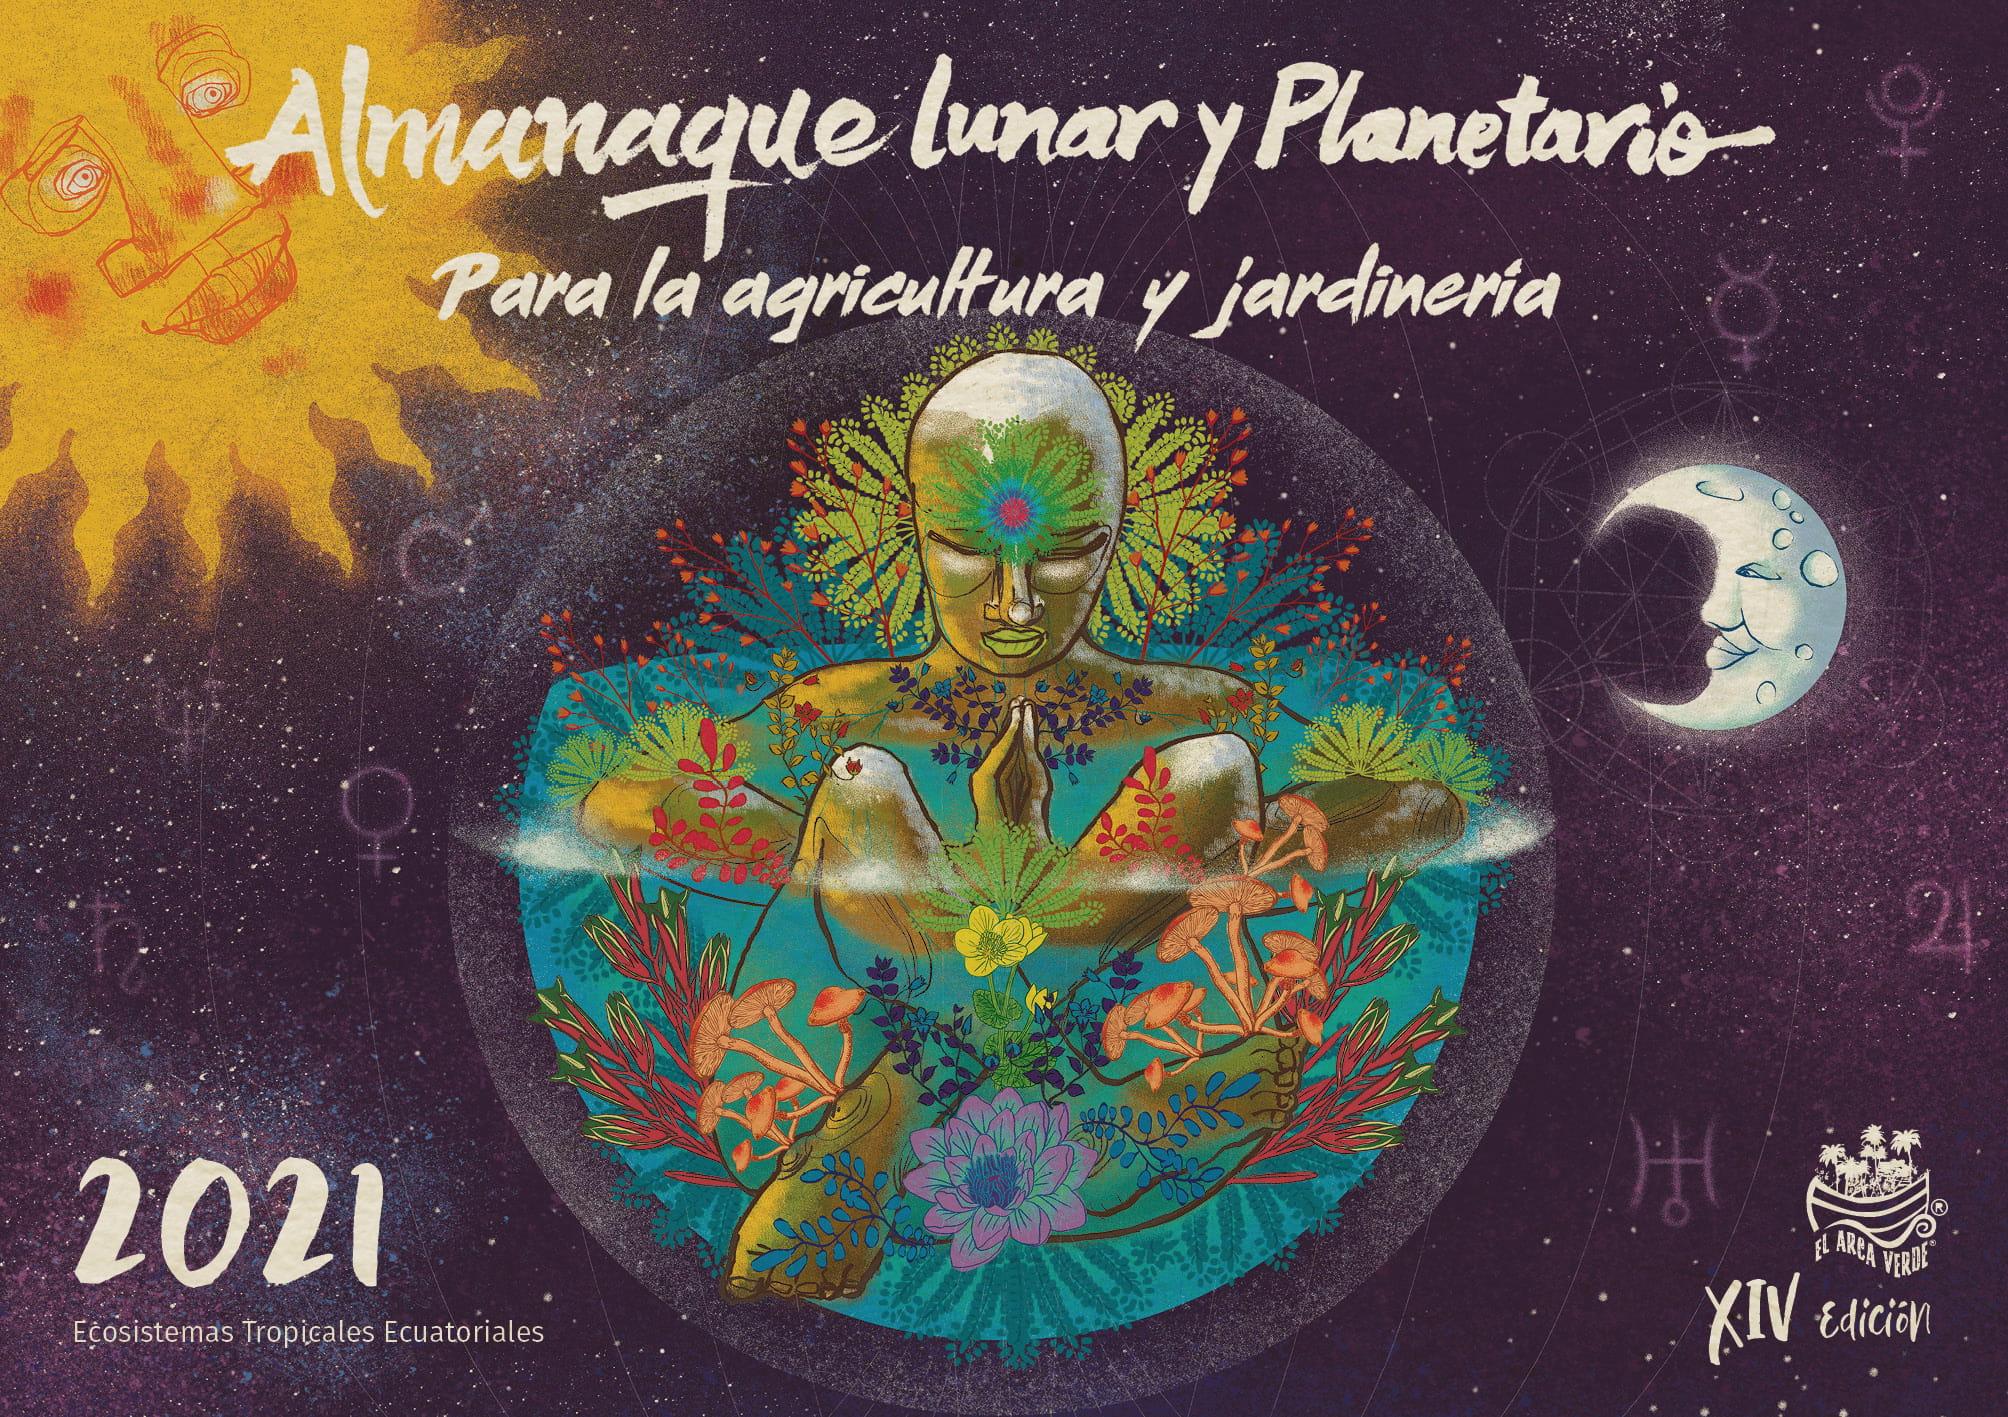 Portada almanaque lunary planetario 2021 - Portafolio